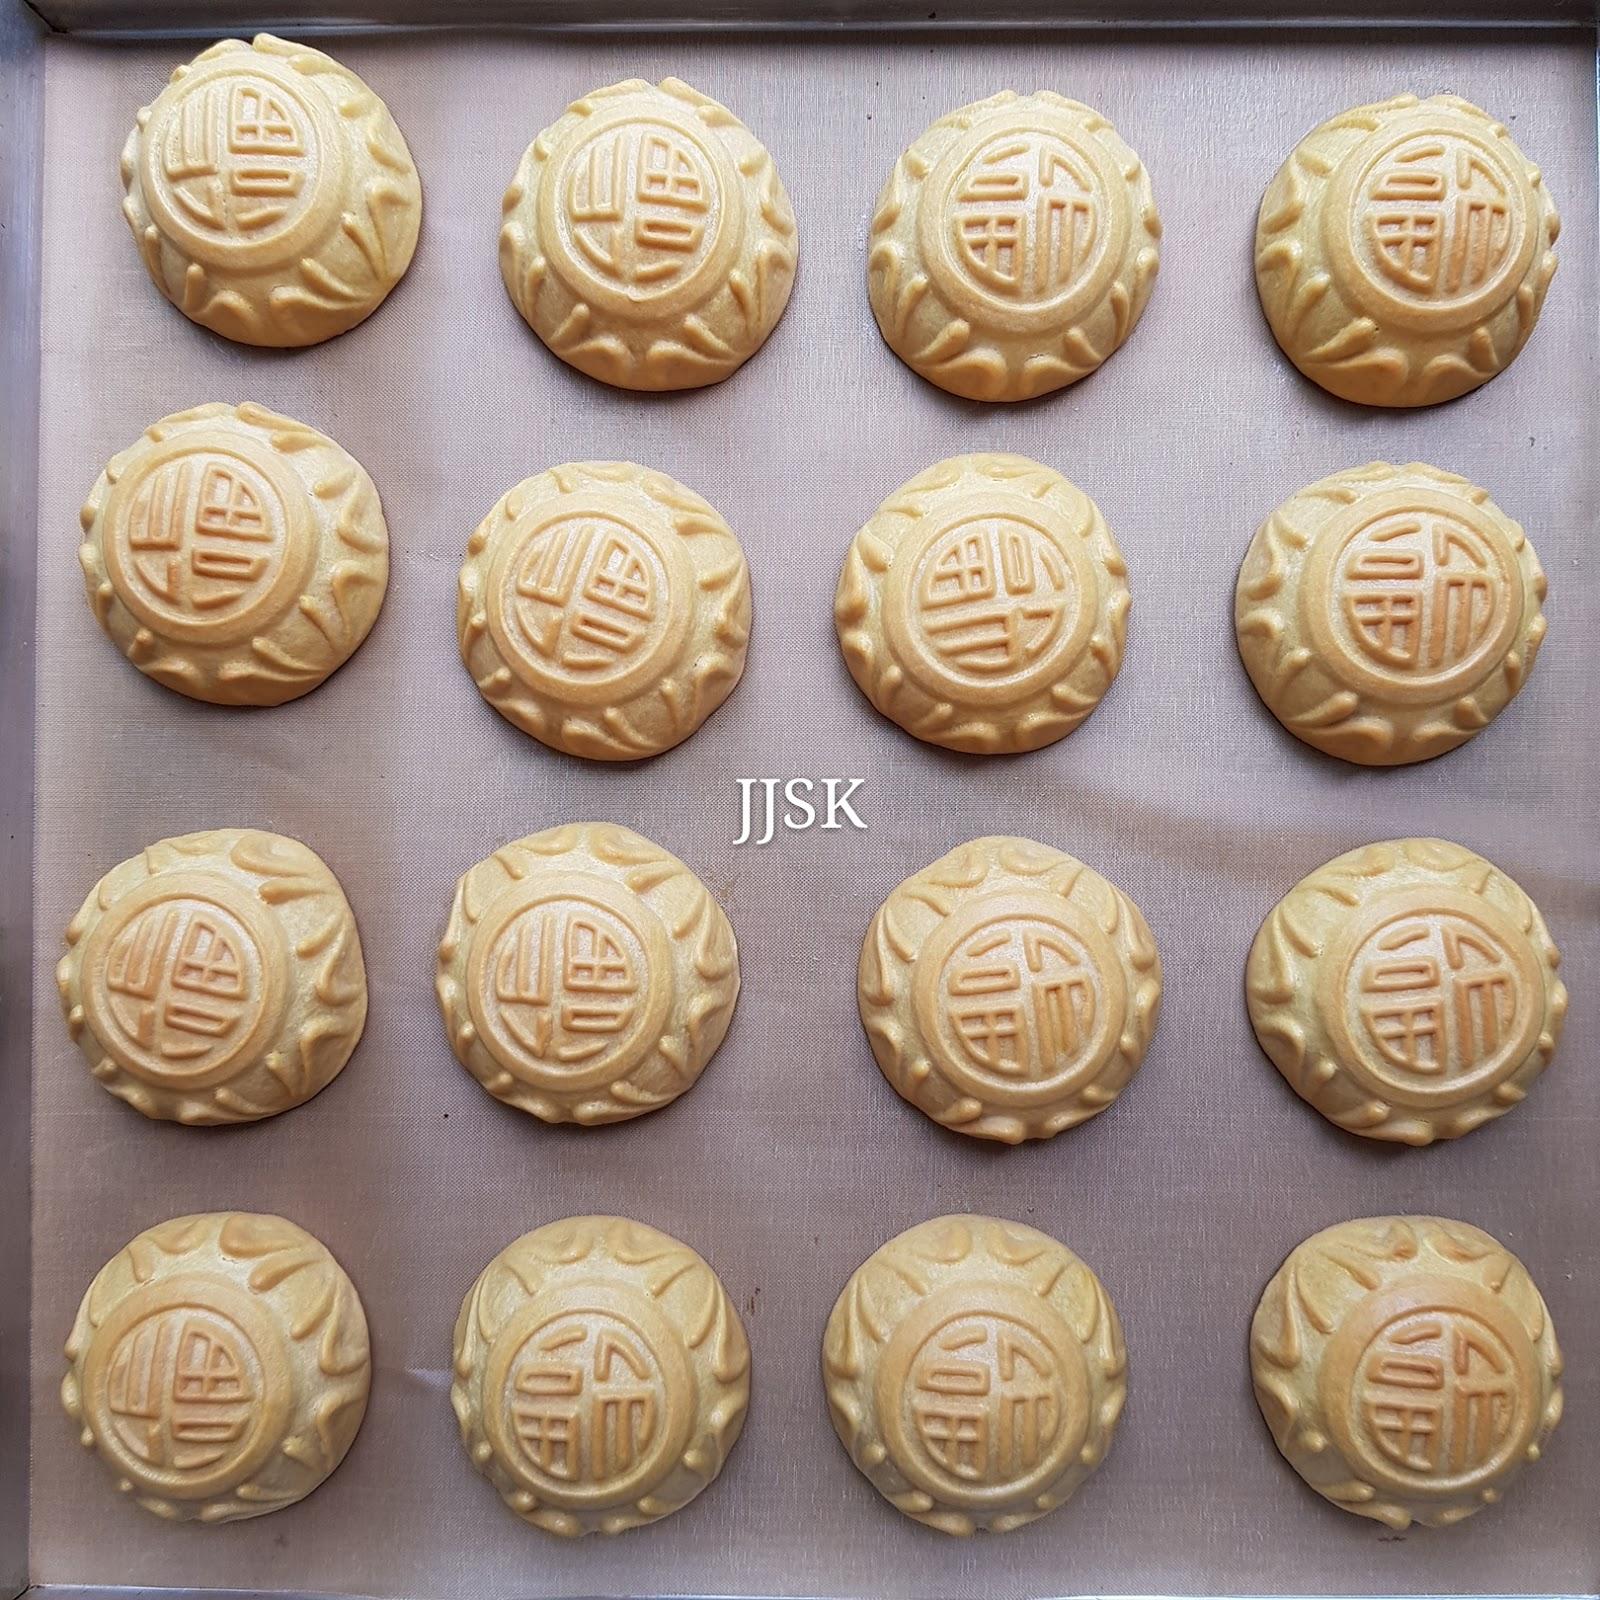 wood mode kitchens value city kitchen sets 爱厨房的幸福之味: 椰丝公仔饼 shredded coconut gong zai bing